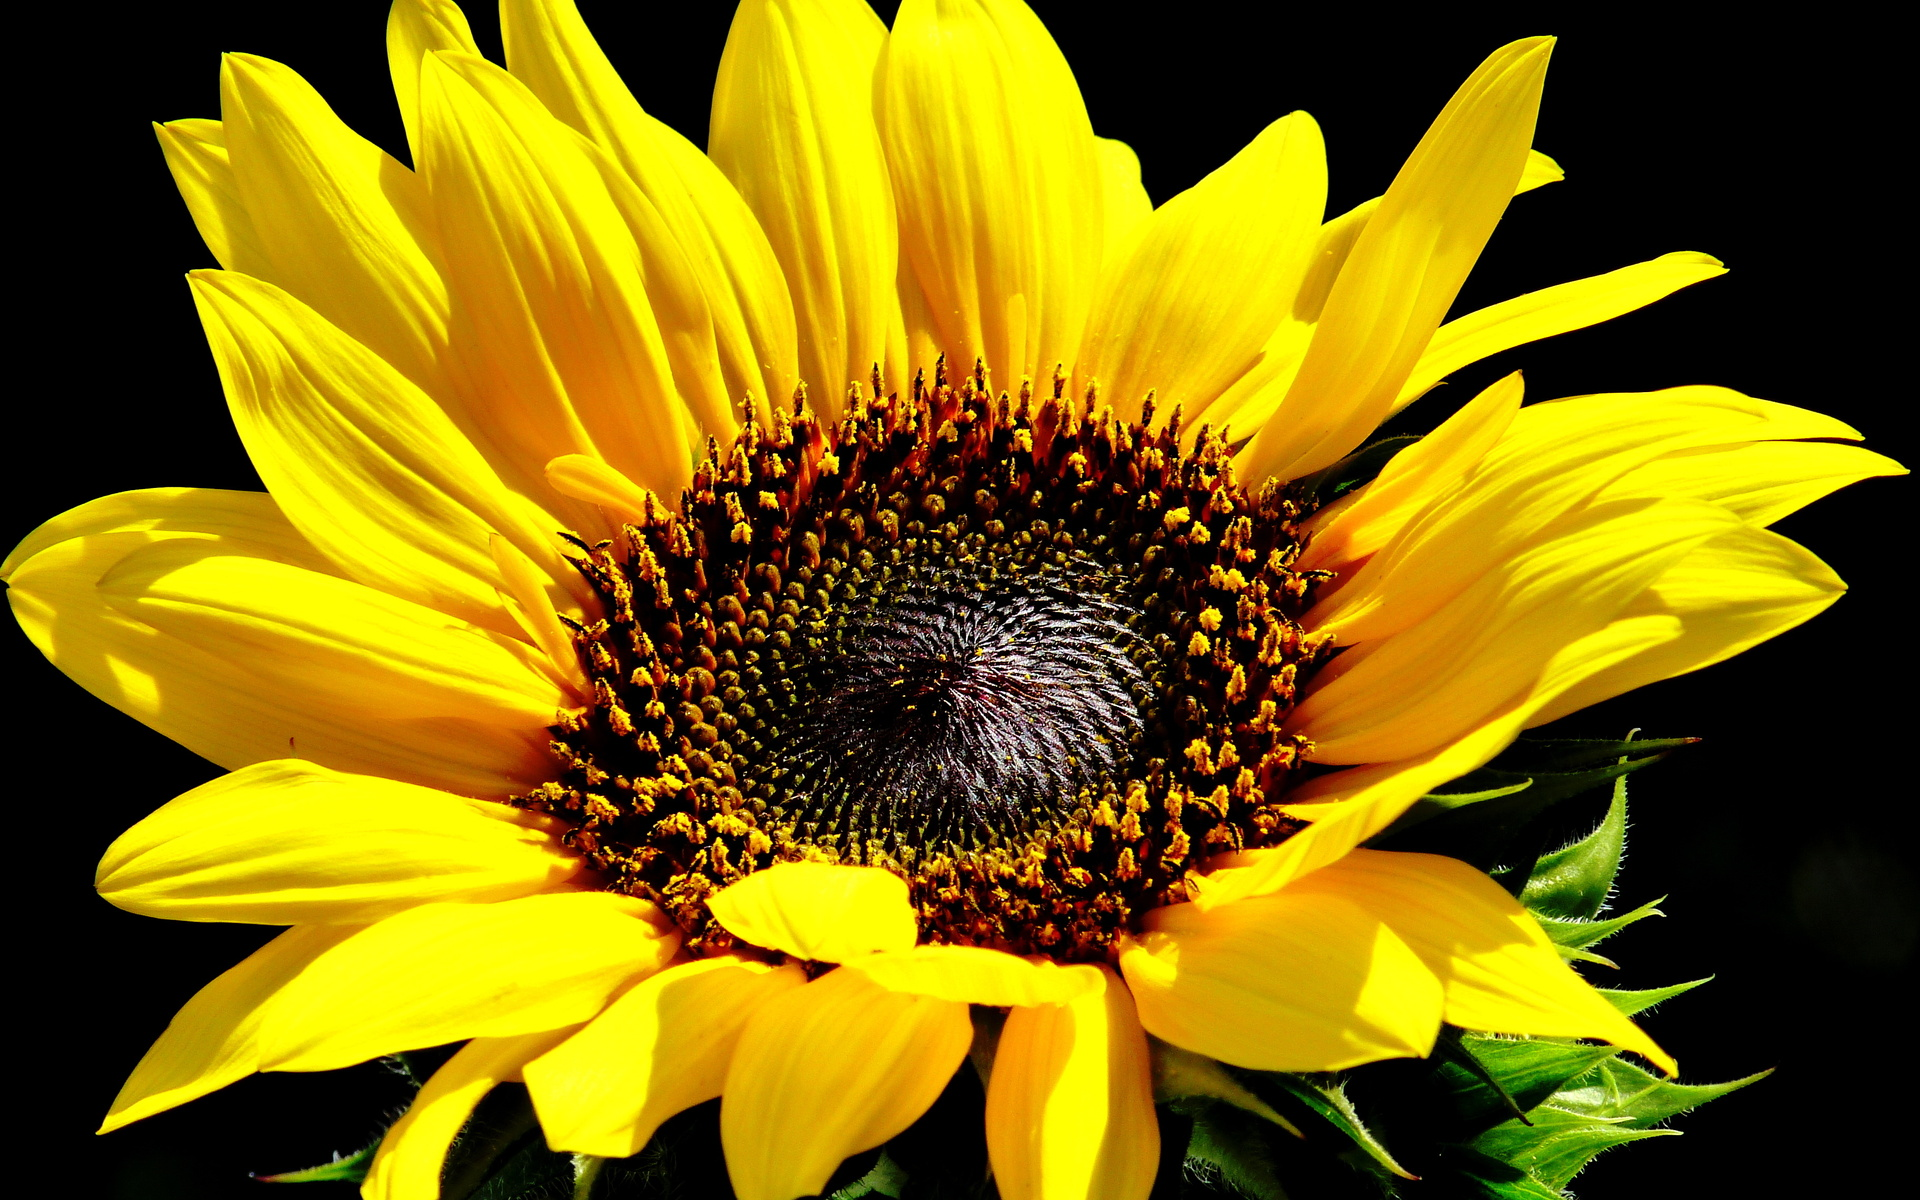 Sunflowers sunflower yellow flower q wallpaper | 1920x1200 ...